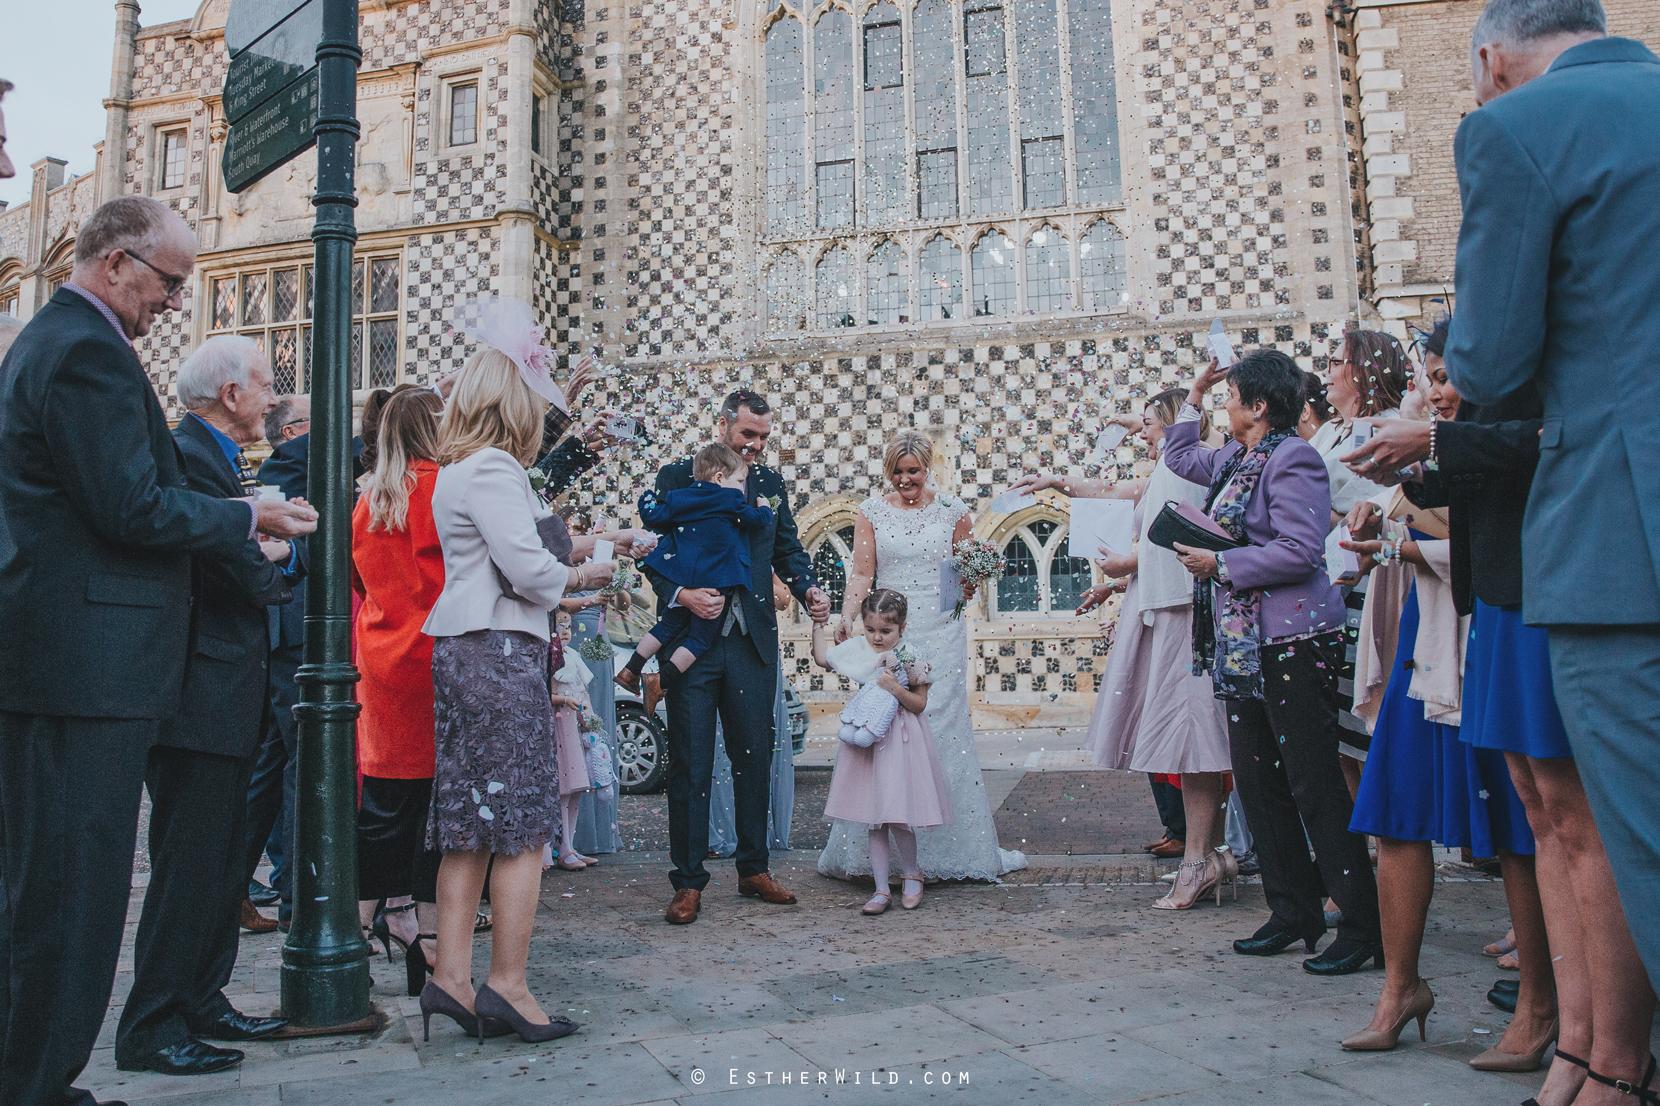 Wedding_Kings_Lynn_Town_Hall_Norfolk_Photographer_Esther_Wild_IMG_1250.jpg